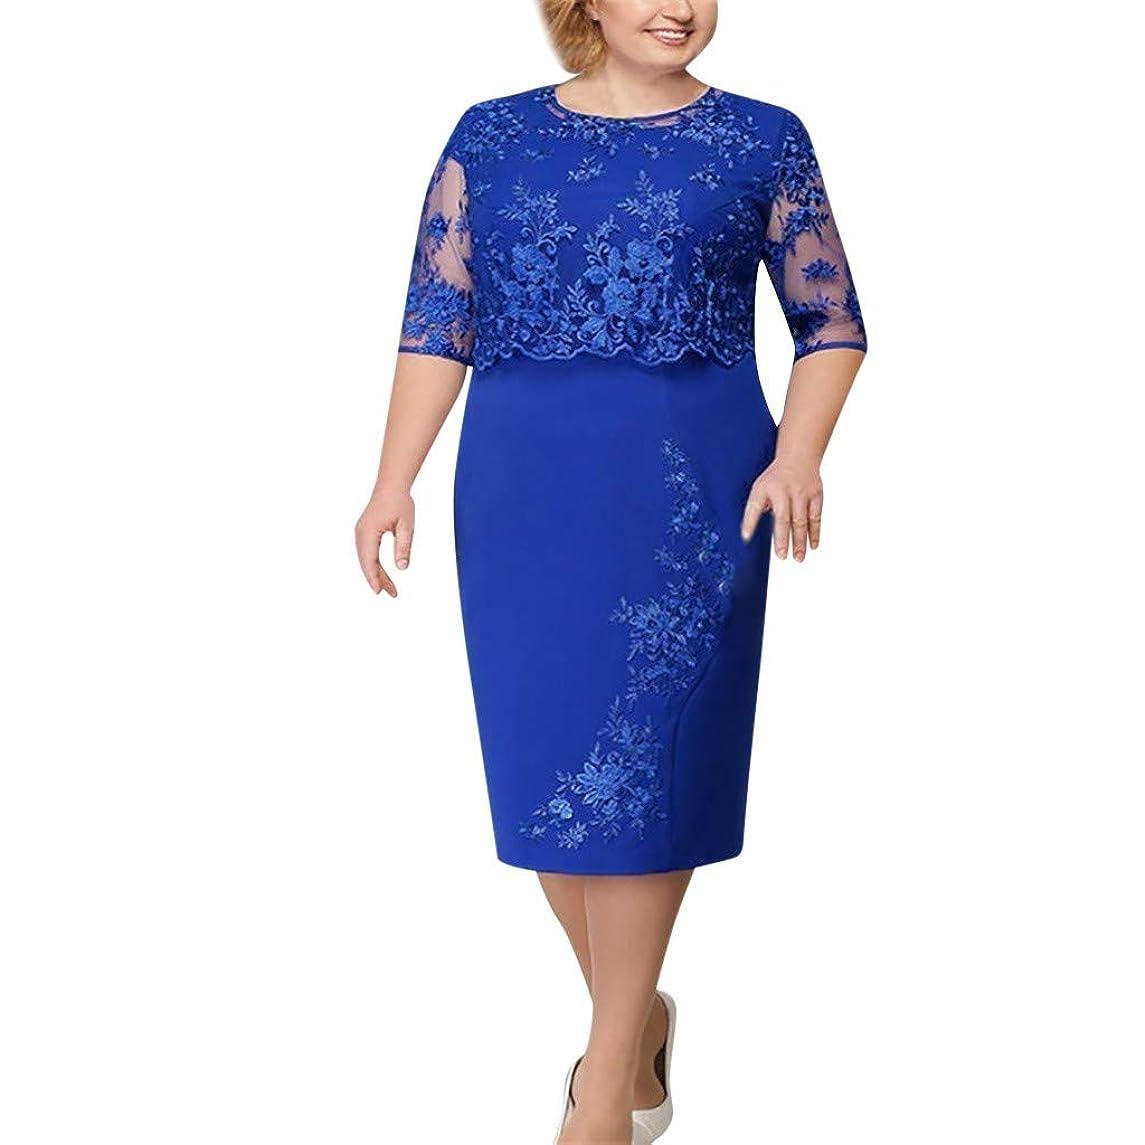 Ghazzi Women Dresses Plus Size Elegant Midi Dress Short Sleeve Lace Patchwork Party Prom Swing Dress Bodycon Beach Sundress